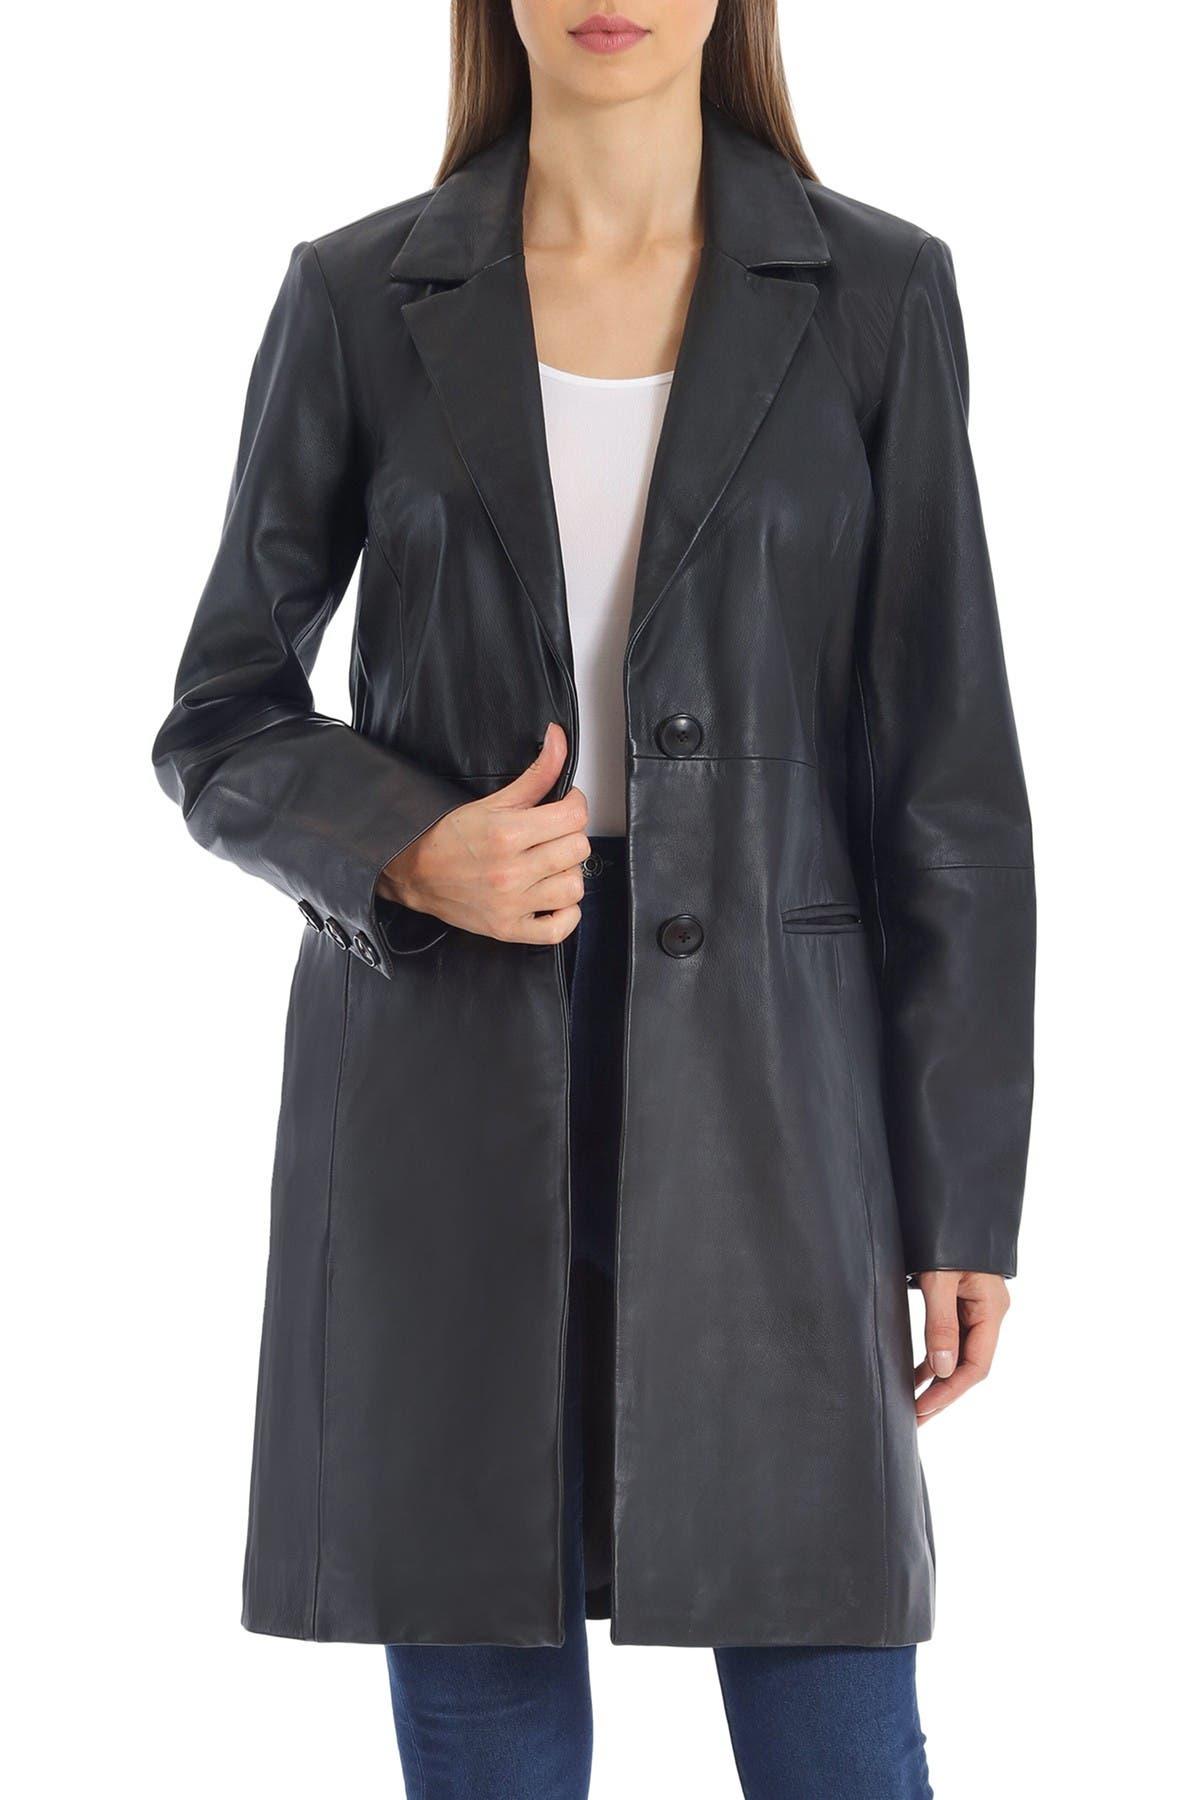 Badgley Mischka Single-Breasted Lamb Leather Jacket